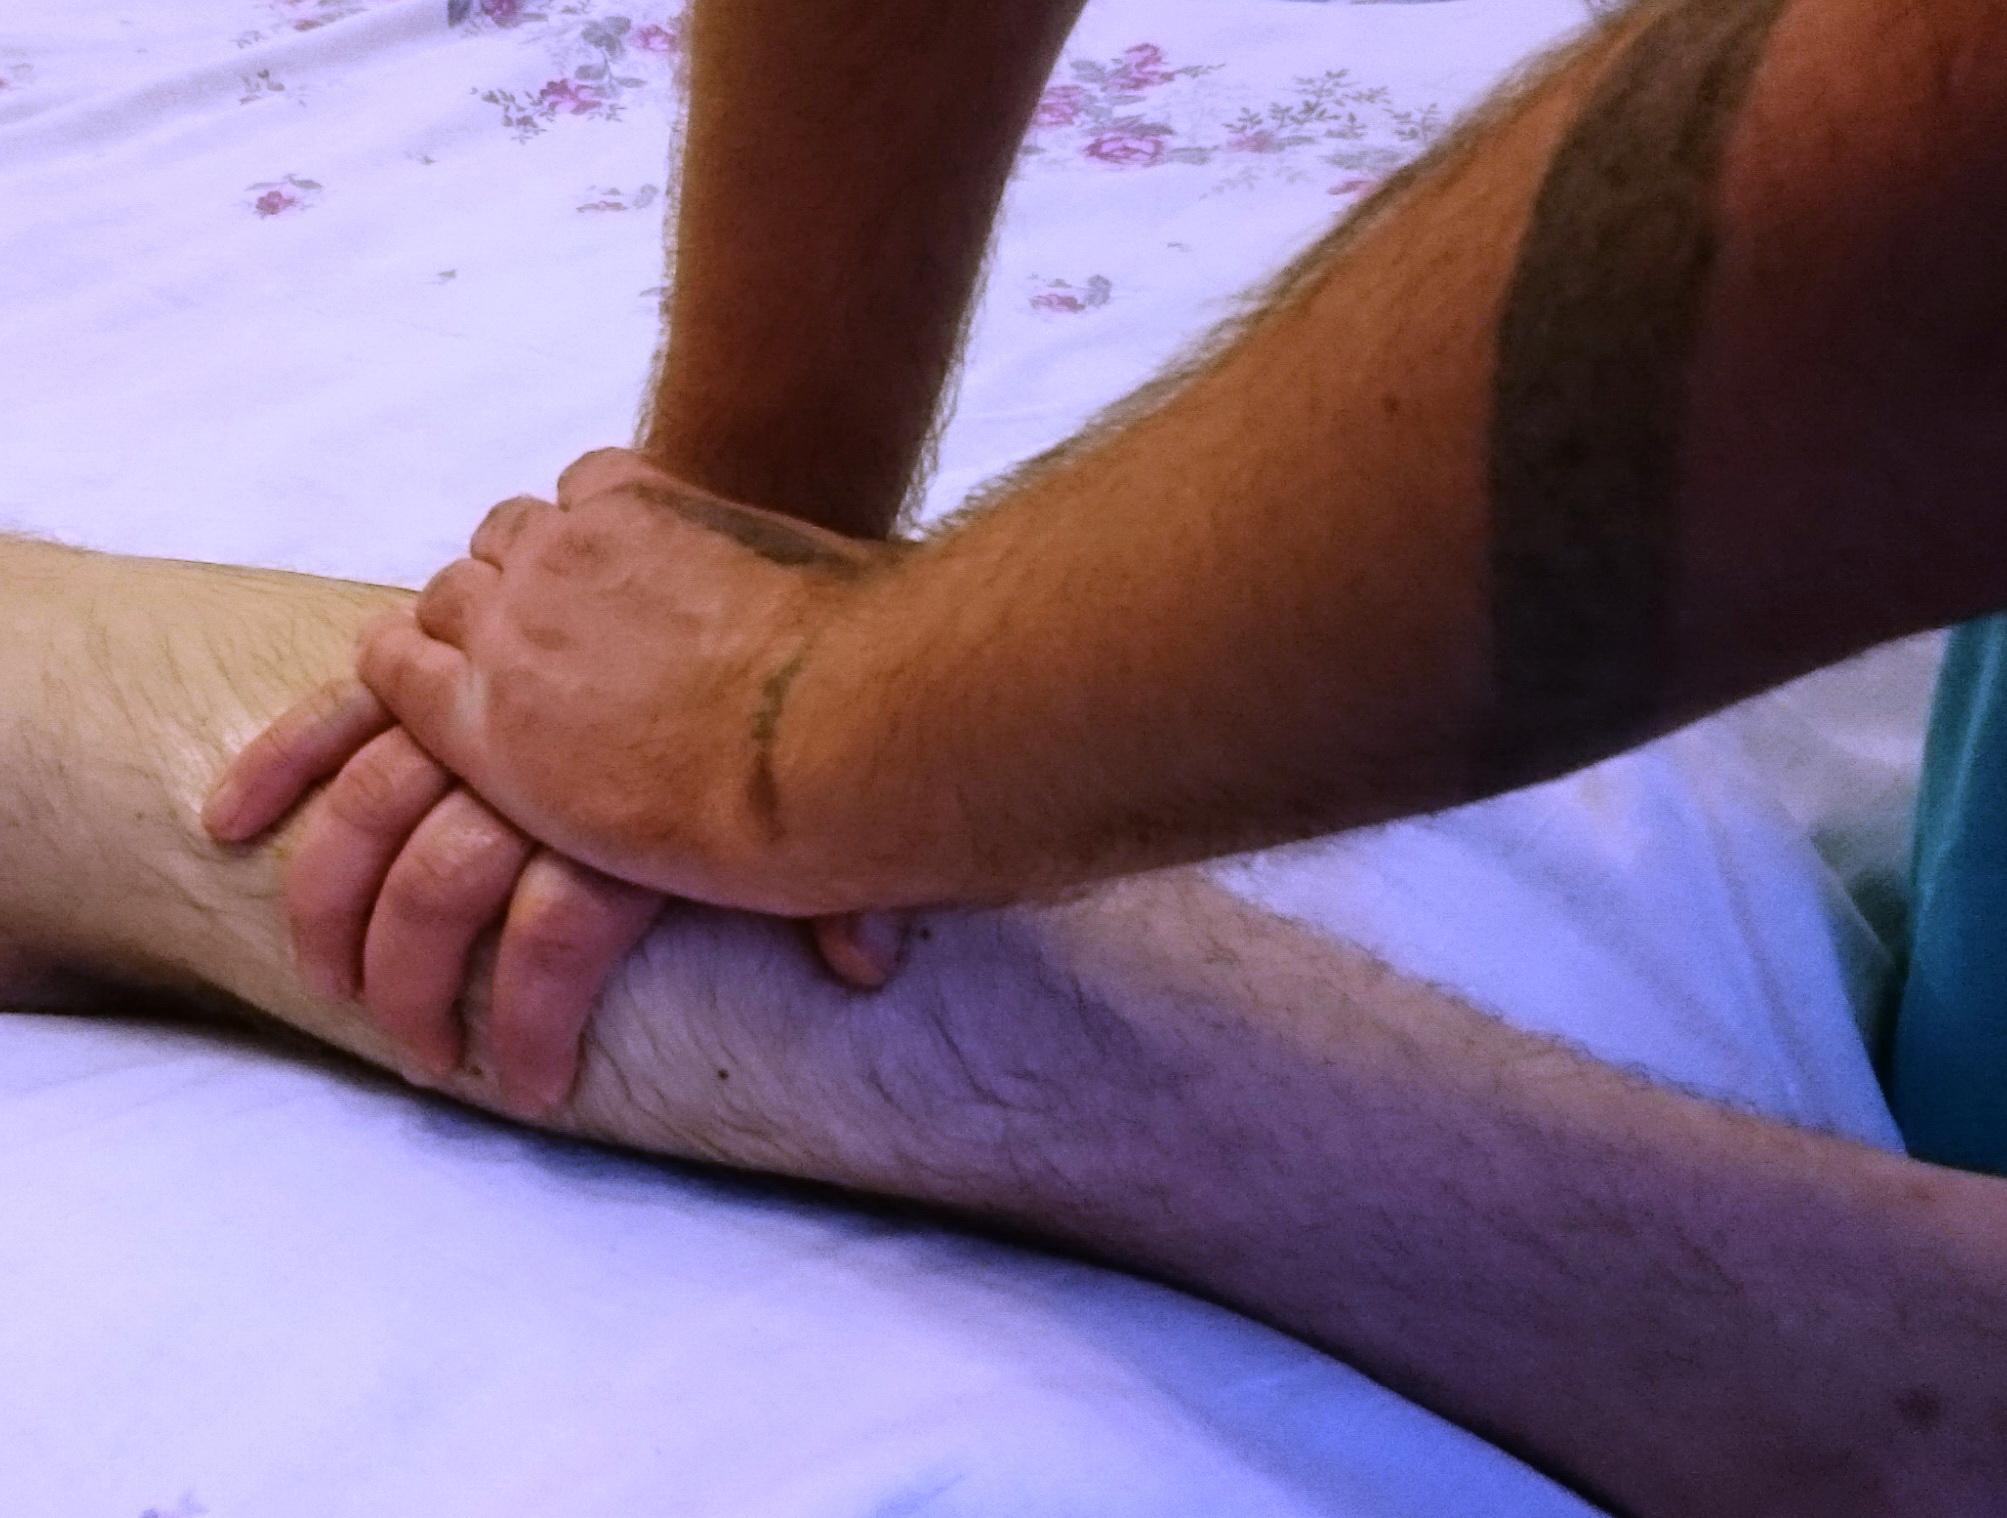 знакомства геев на досках объявлений спб